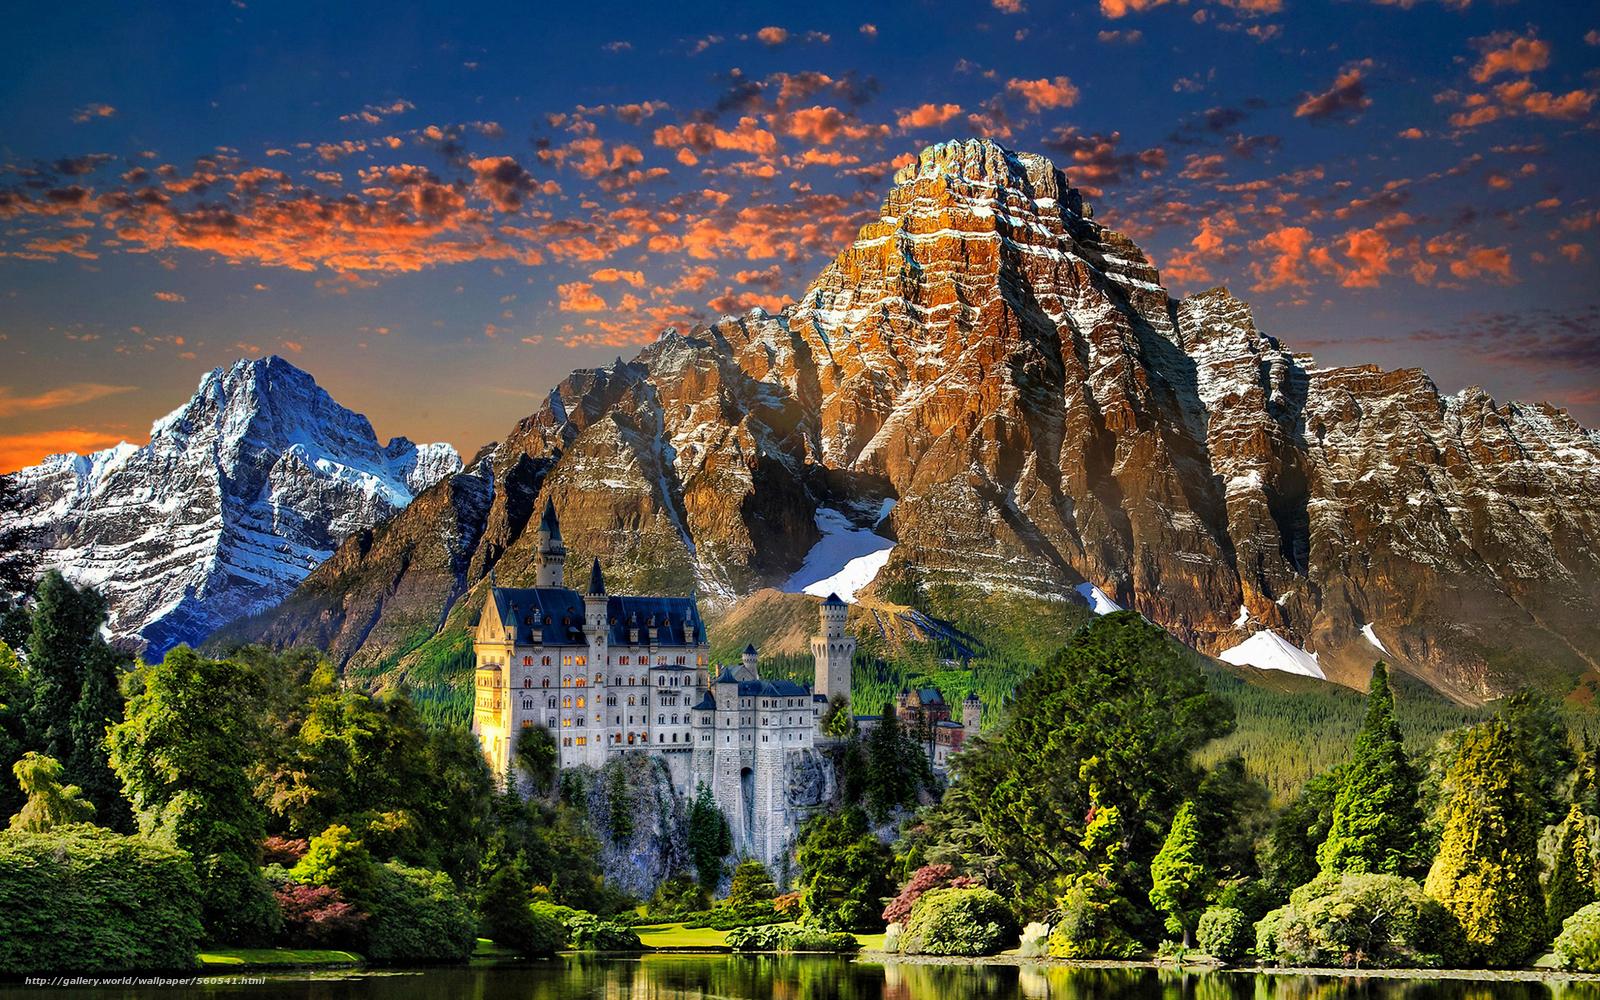 Neyshvanshteyn Munich Germany landscape desktop wallpaper 1600x1000